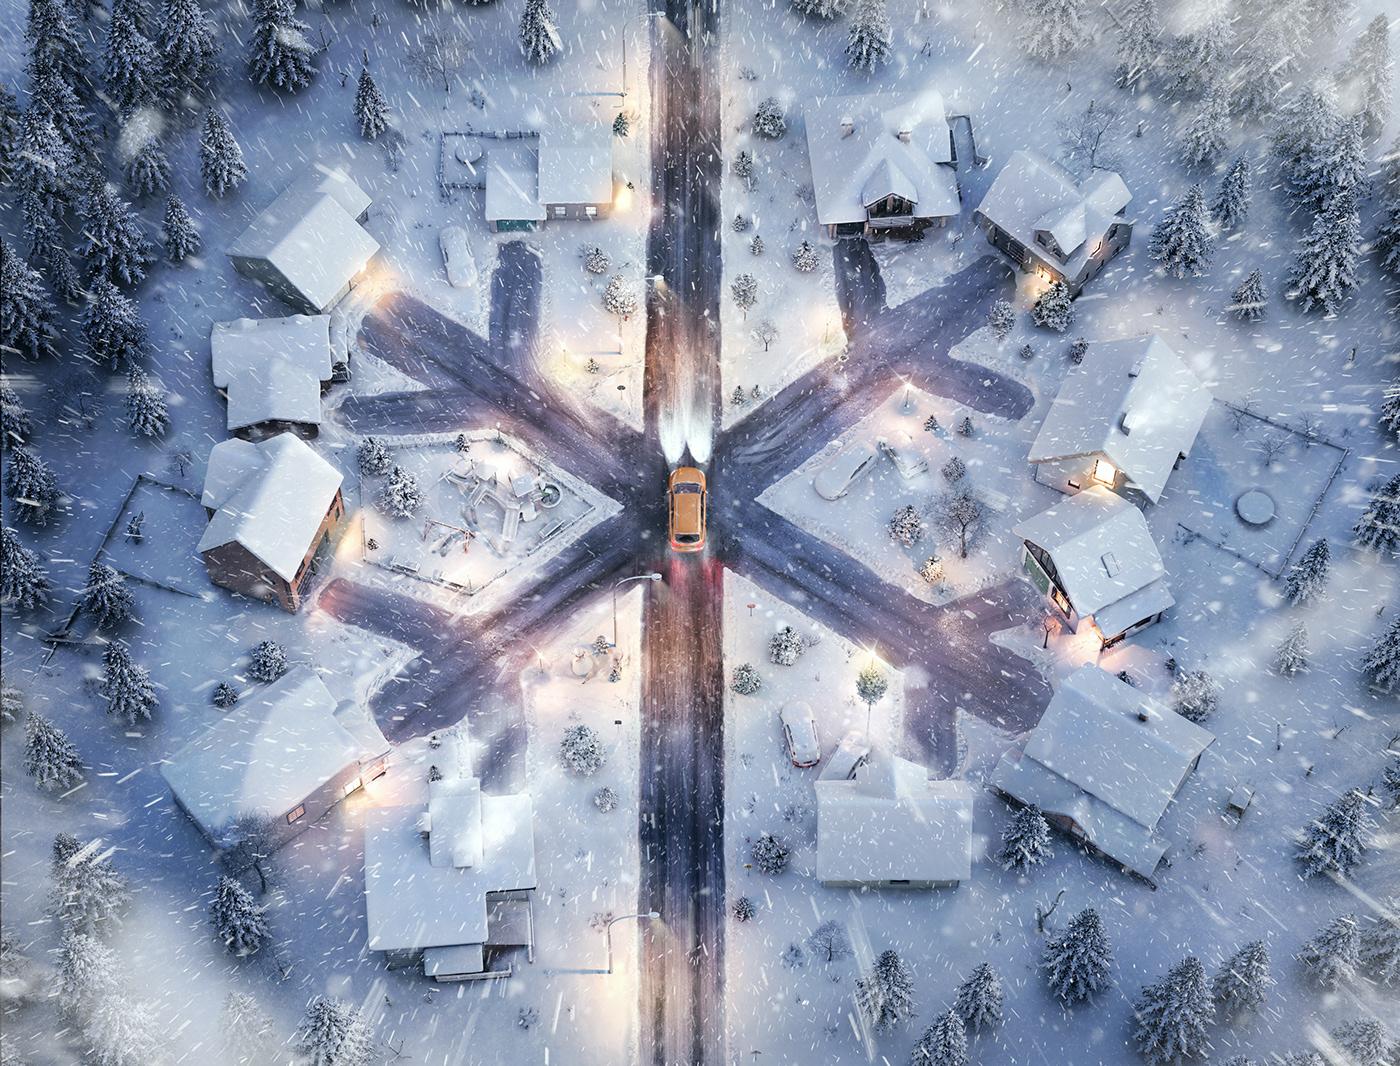 ad Audi bee beeistanbul istanbul print quattro snow tribal winter